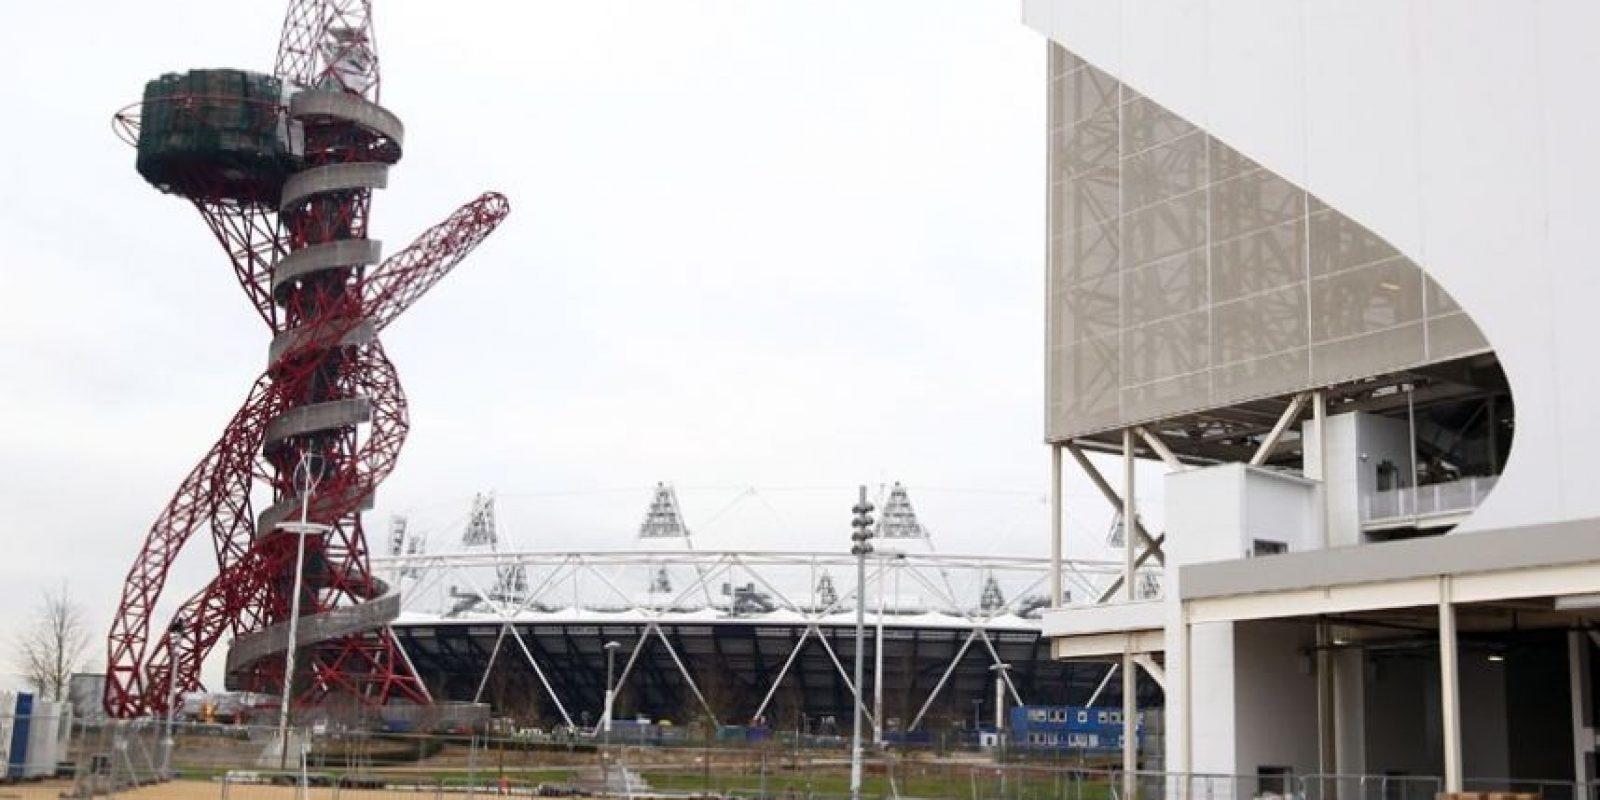 Londres, Parque olímpico. 2012 Foto:Gett